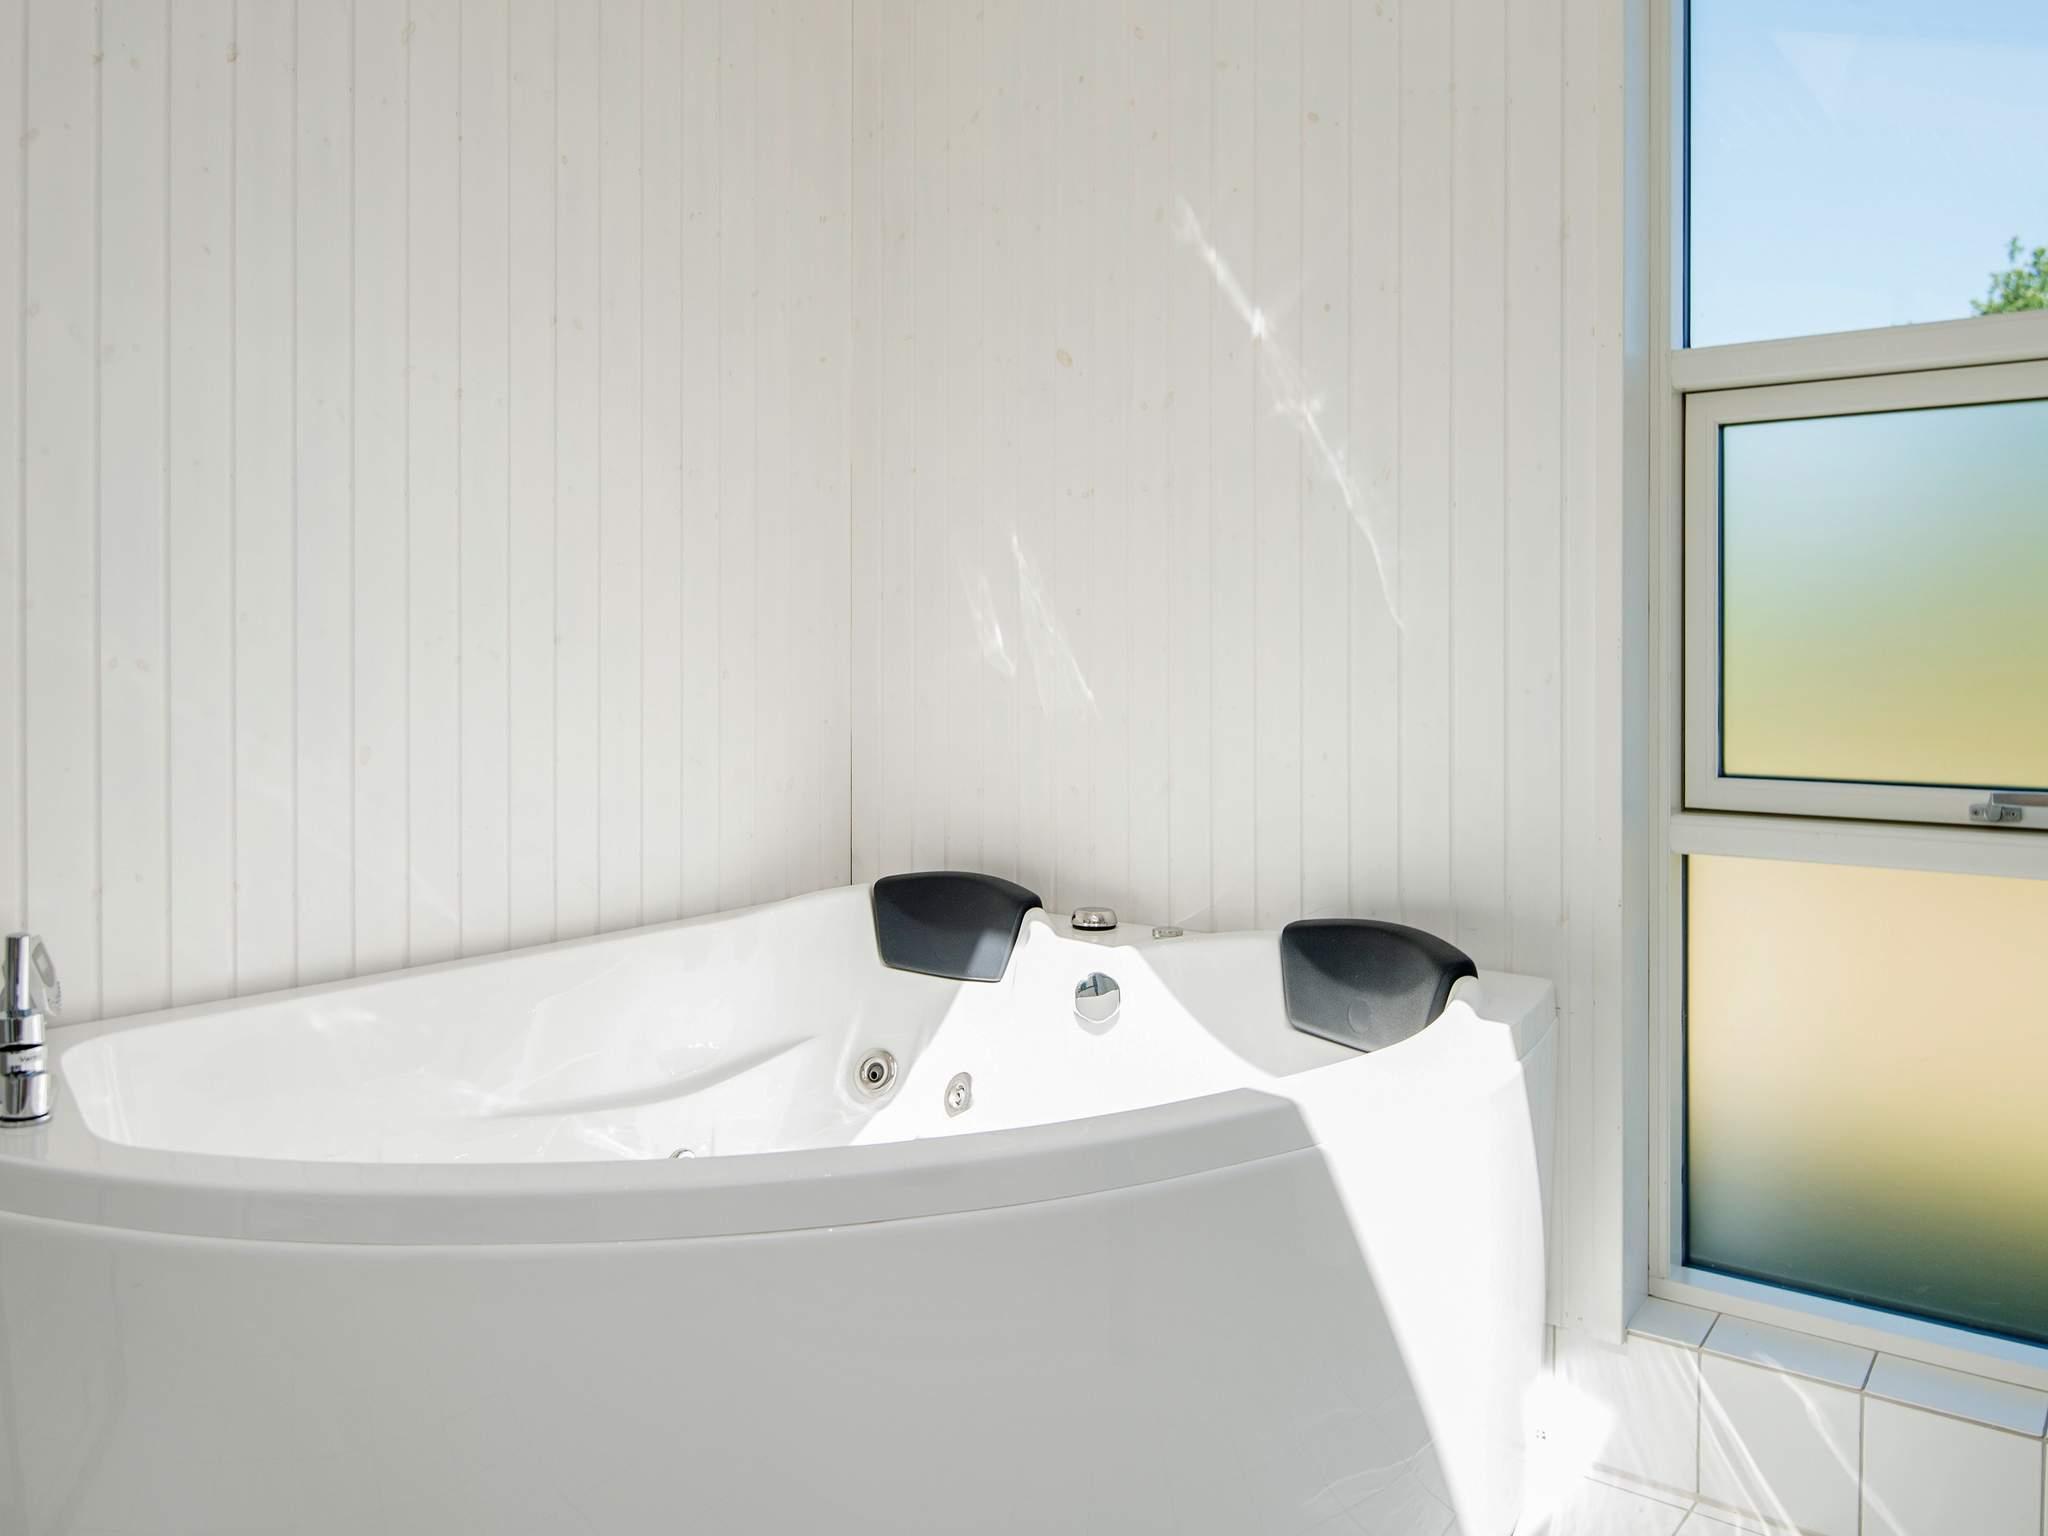 Maison de vacances Helgenæs (978615), Knebel, , Mer Baltique danoise, Danemark, image 14